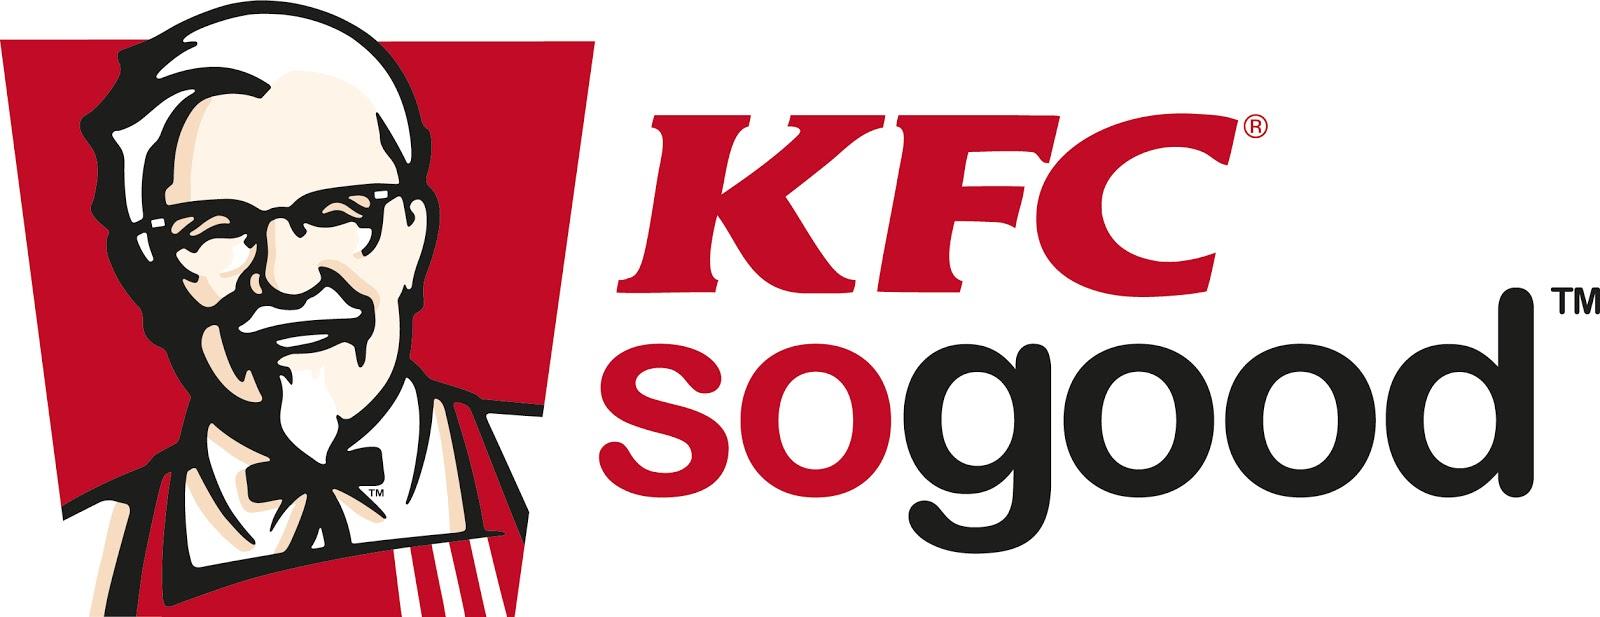 image logo kfc